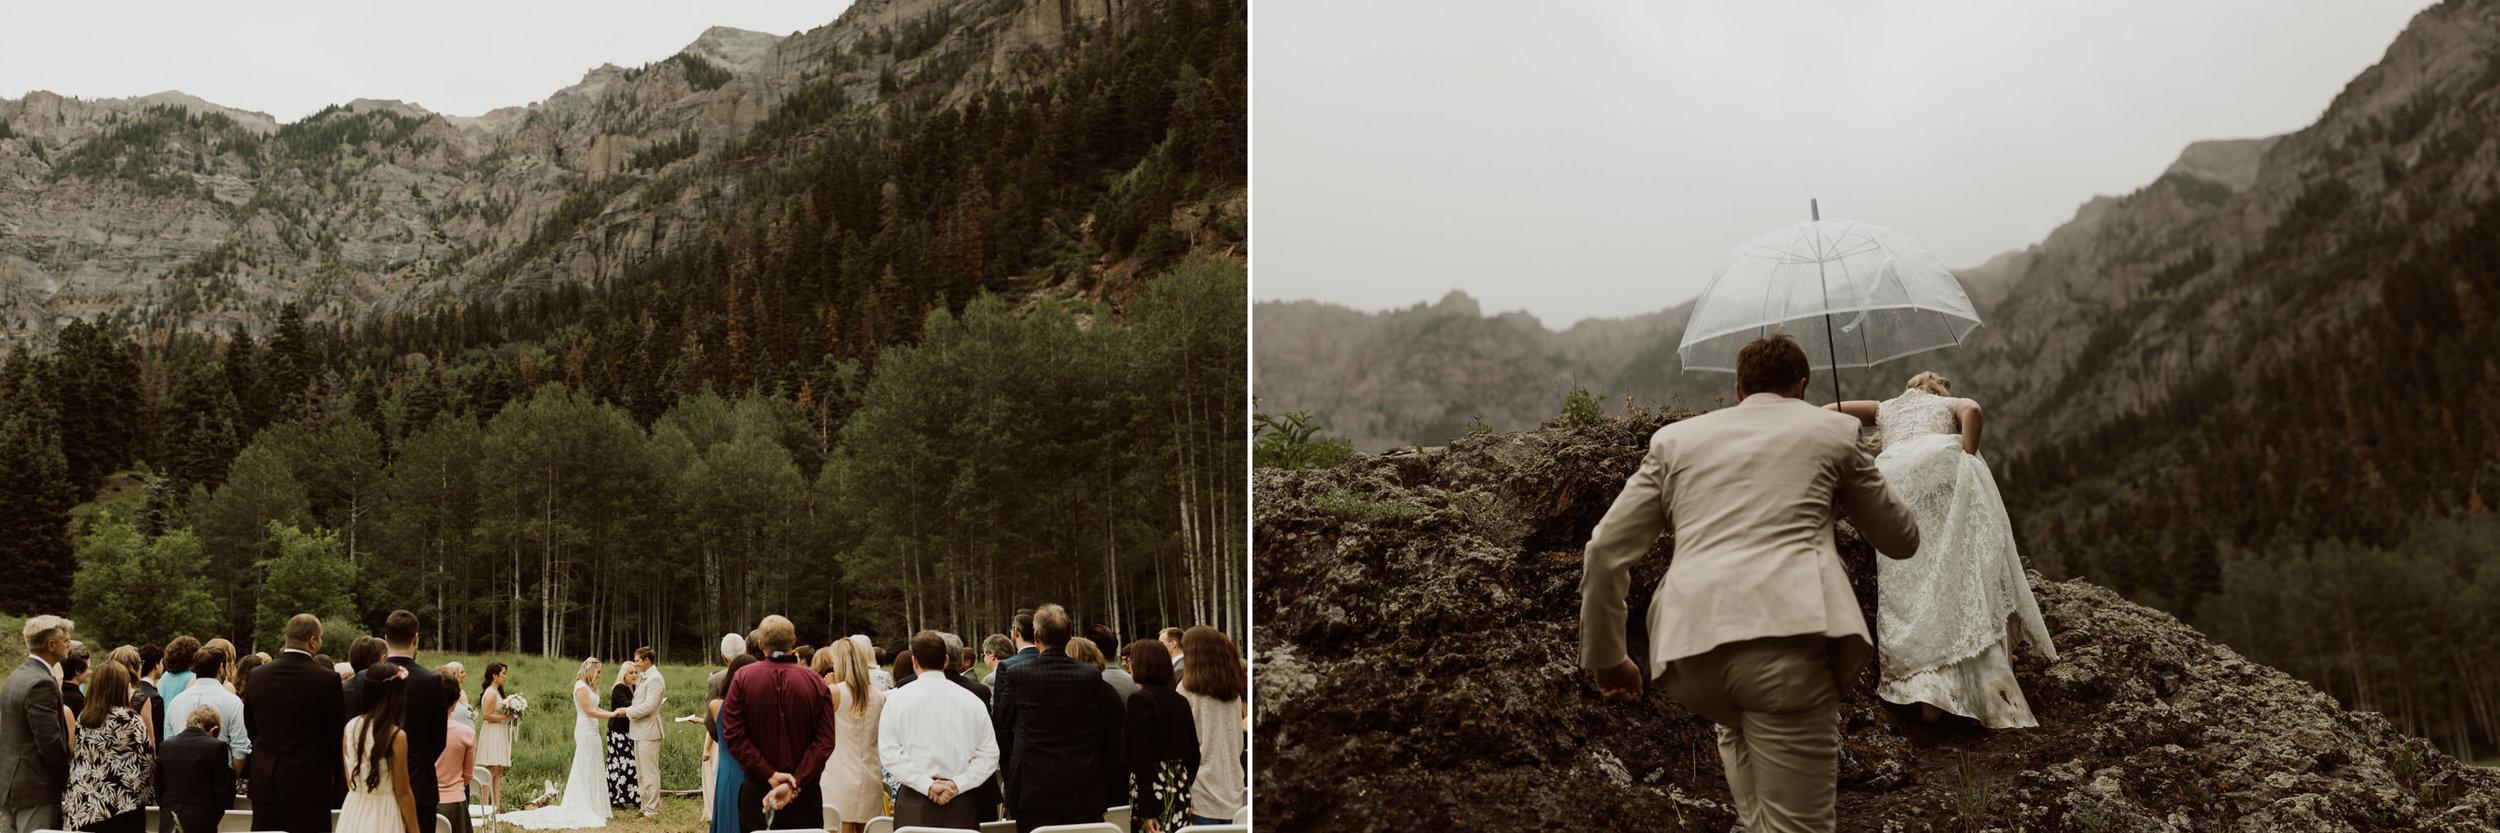 17-7-adventure-wedding-photographer-26.jpg